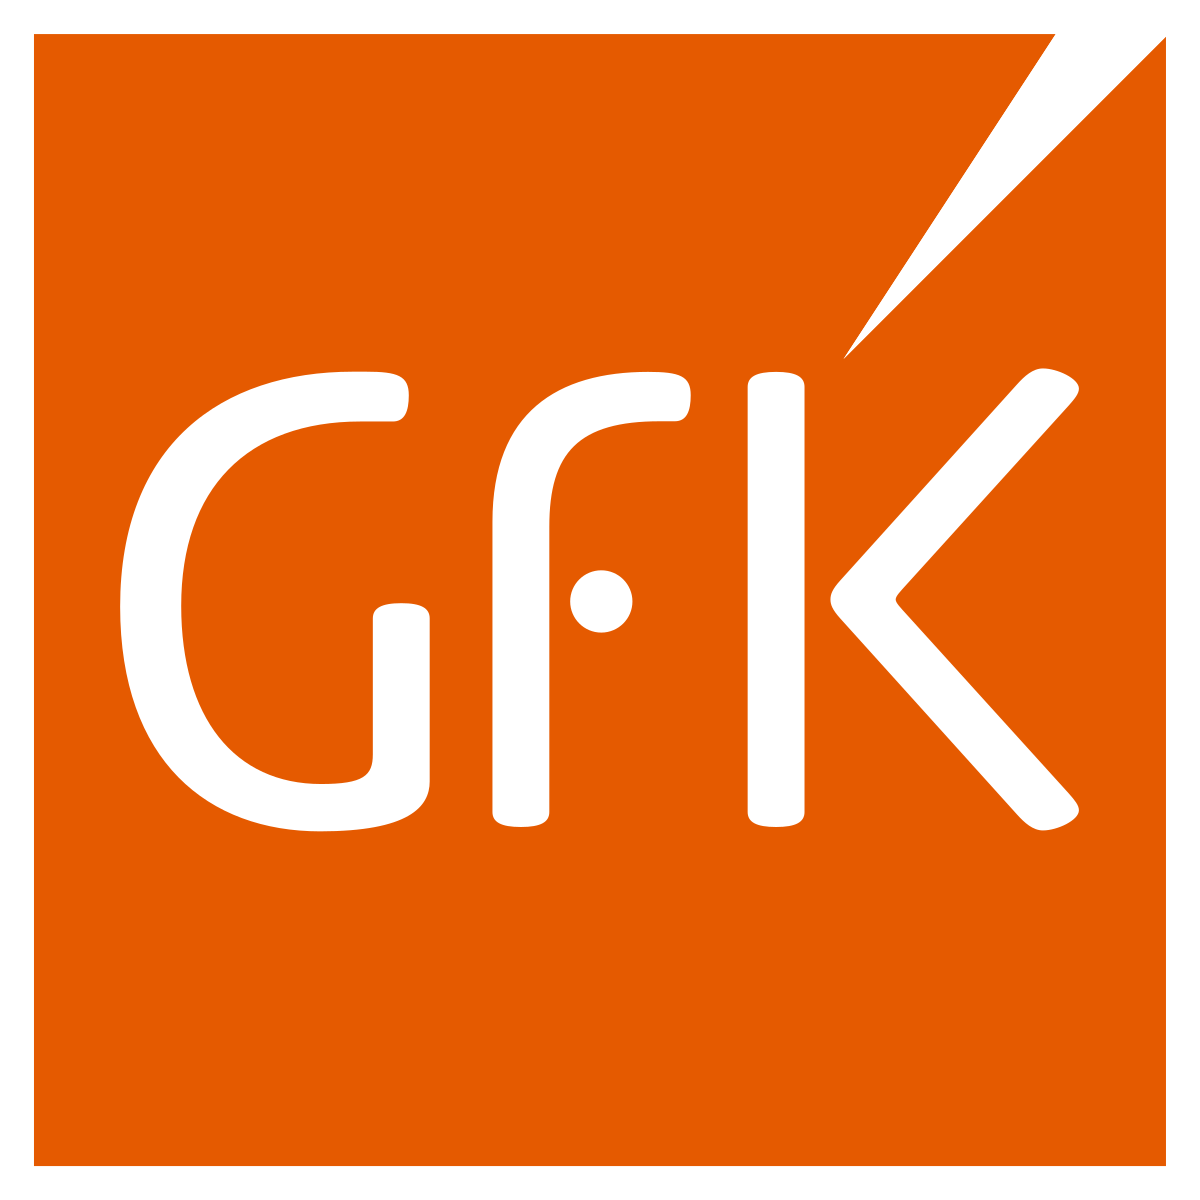 gfk_se